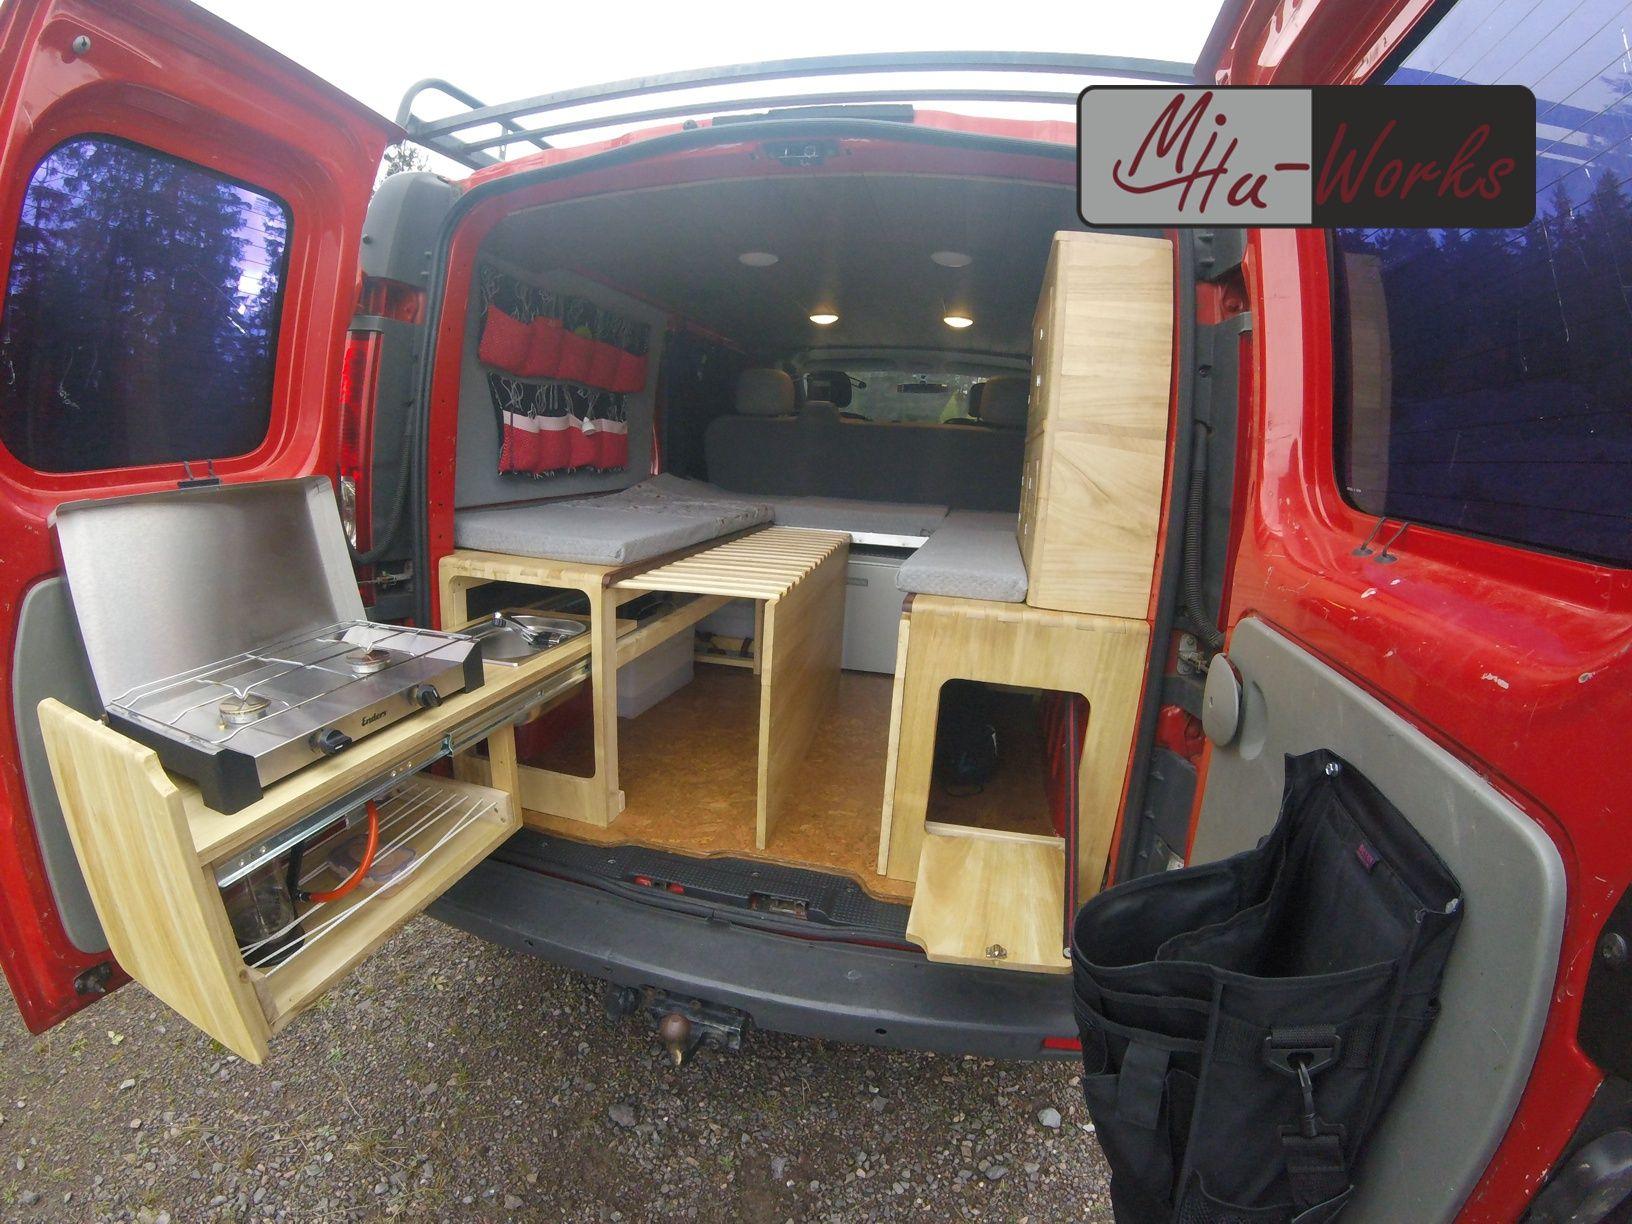 DIY Camper Ausbau – Opel Vivaro – MiHu-Works  Camping ausbau